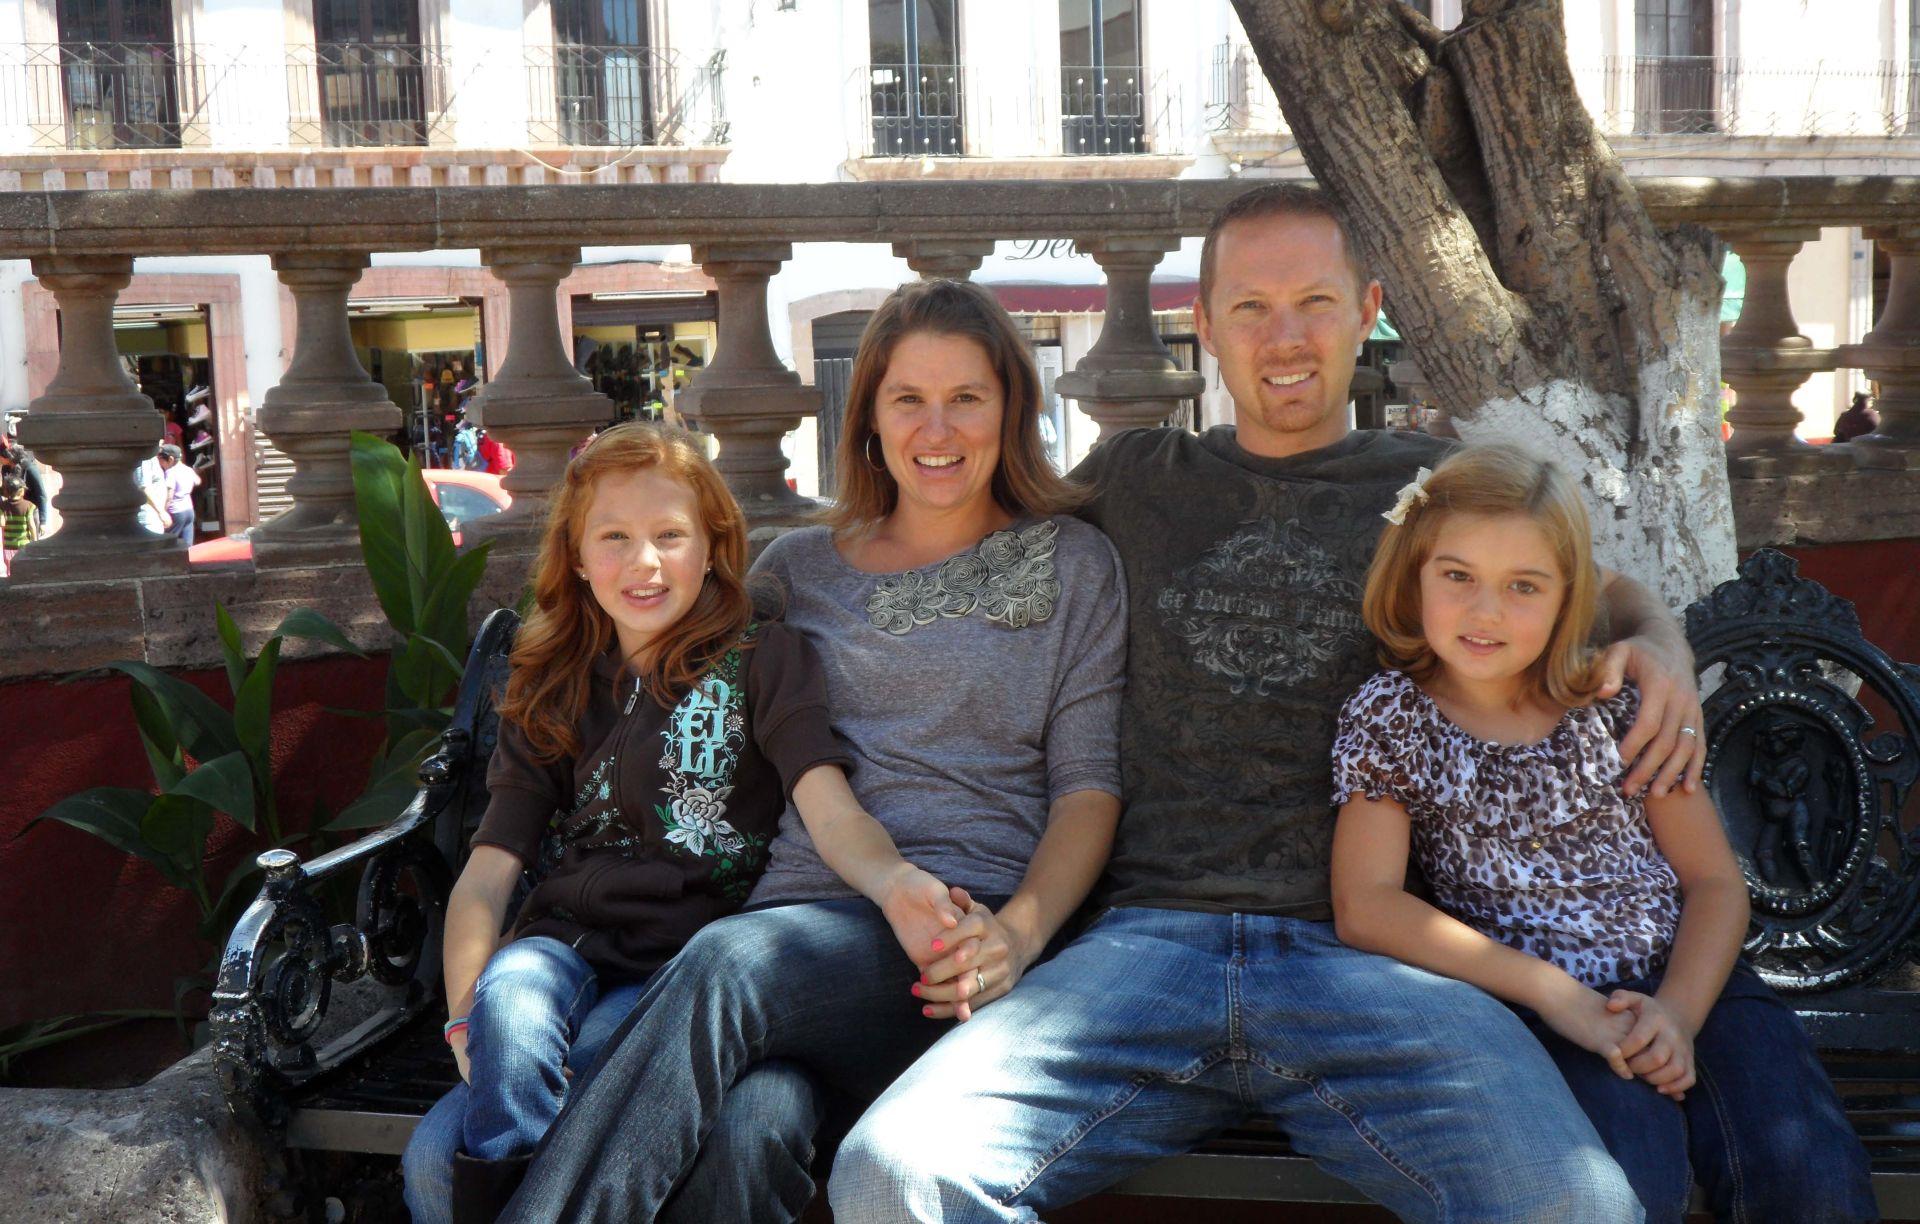 Josh, Heather, hattie & grace - January 2014